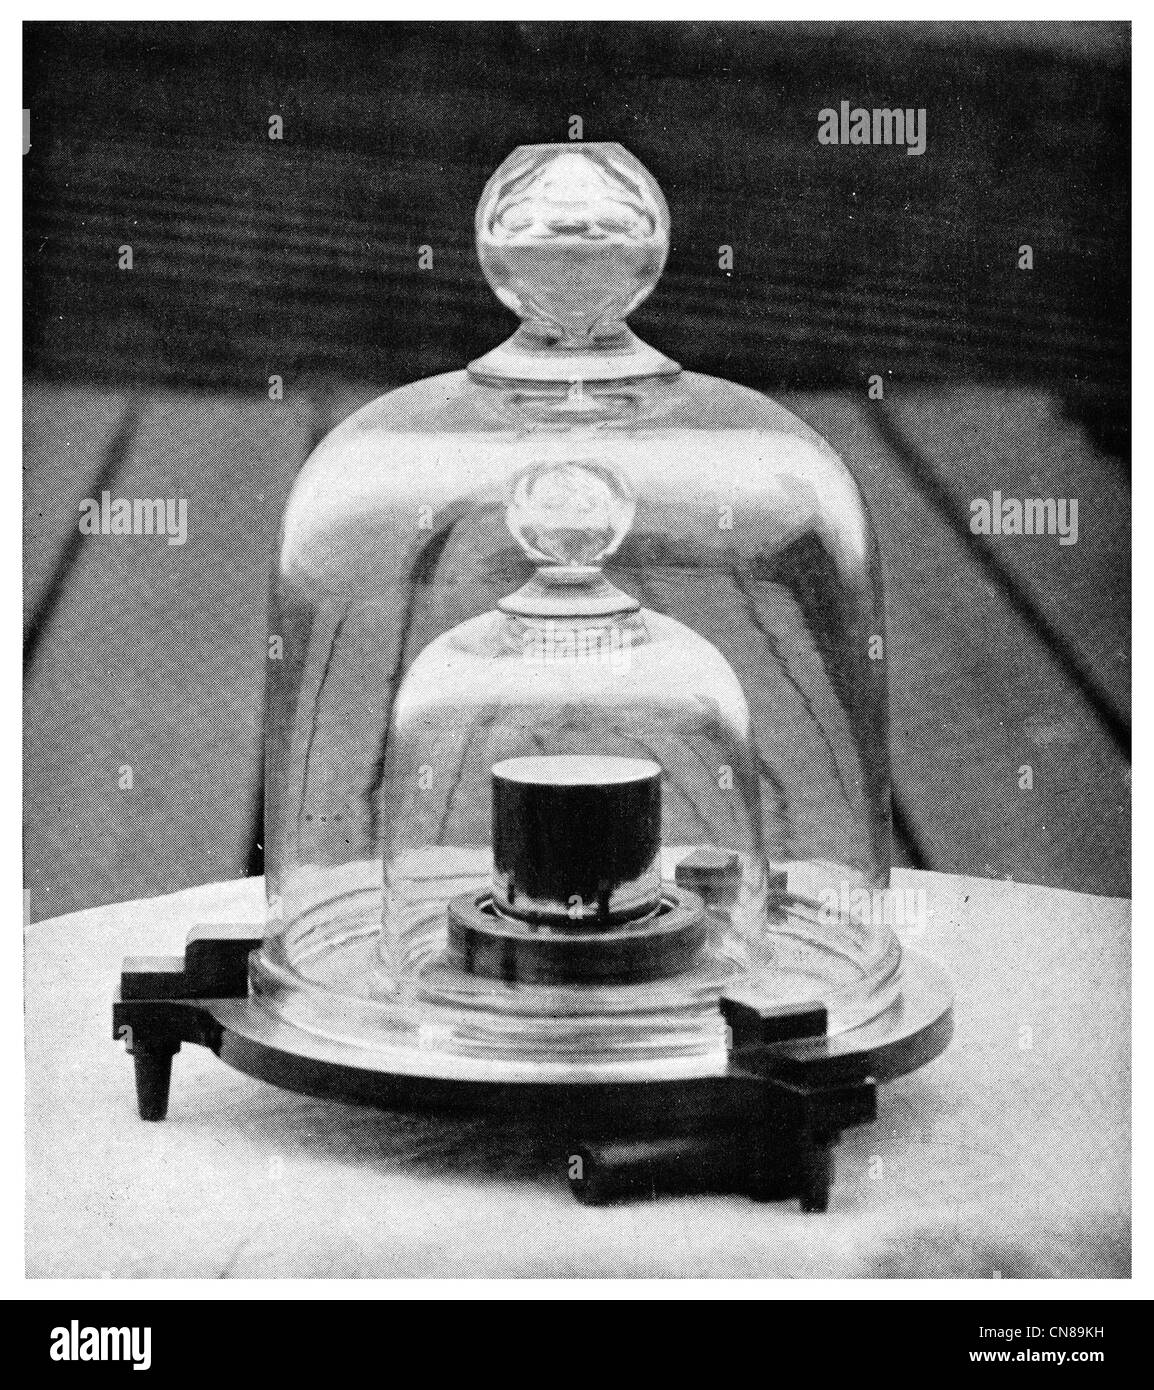 First published 1915 Standard Kilogram Kilo Gram weight Pound Troy Avoirdupois - Stock Image